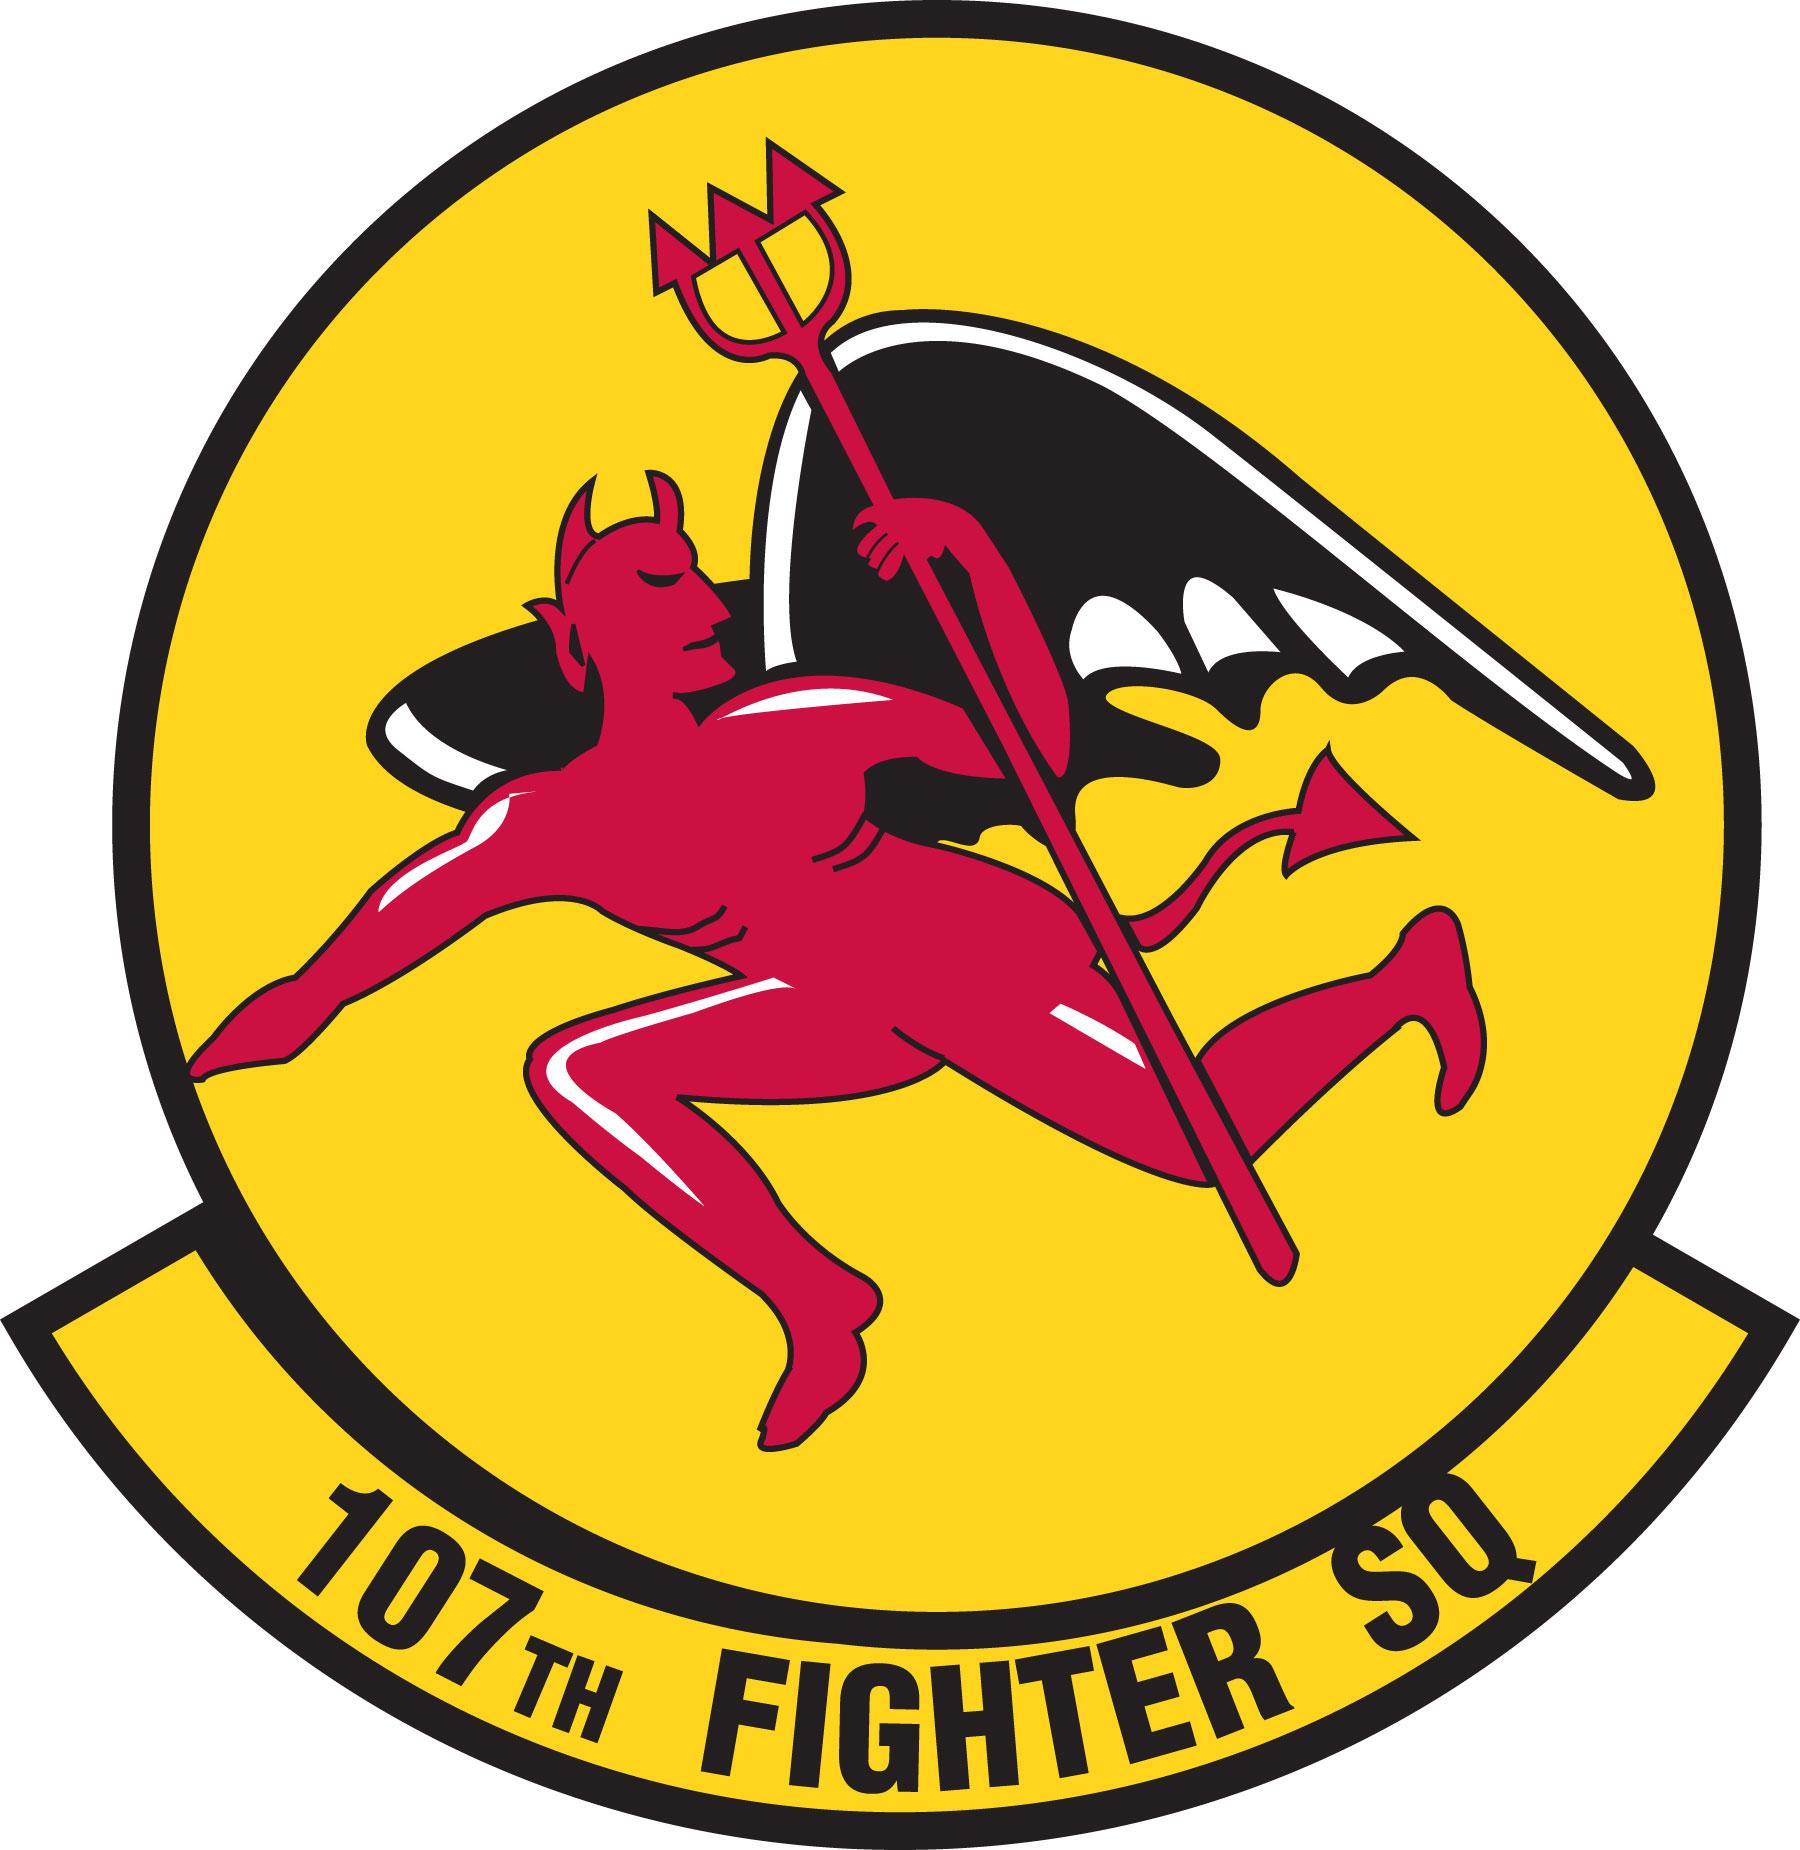 Fighter Squadron Logos File:107th Fighter Squadron